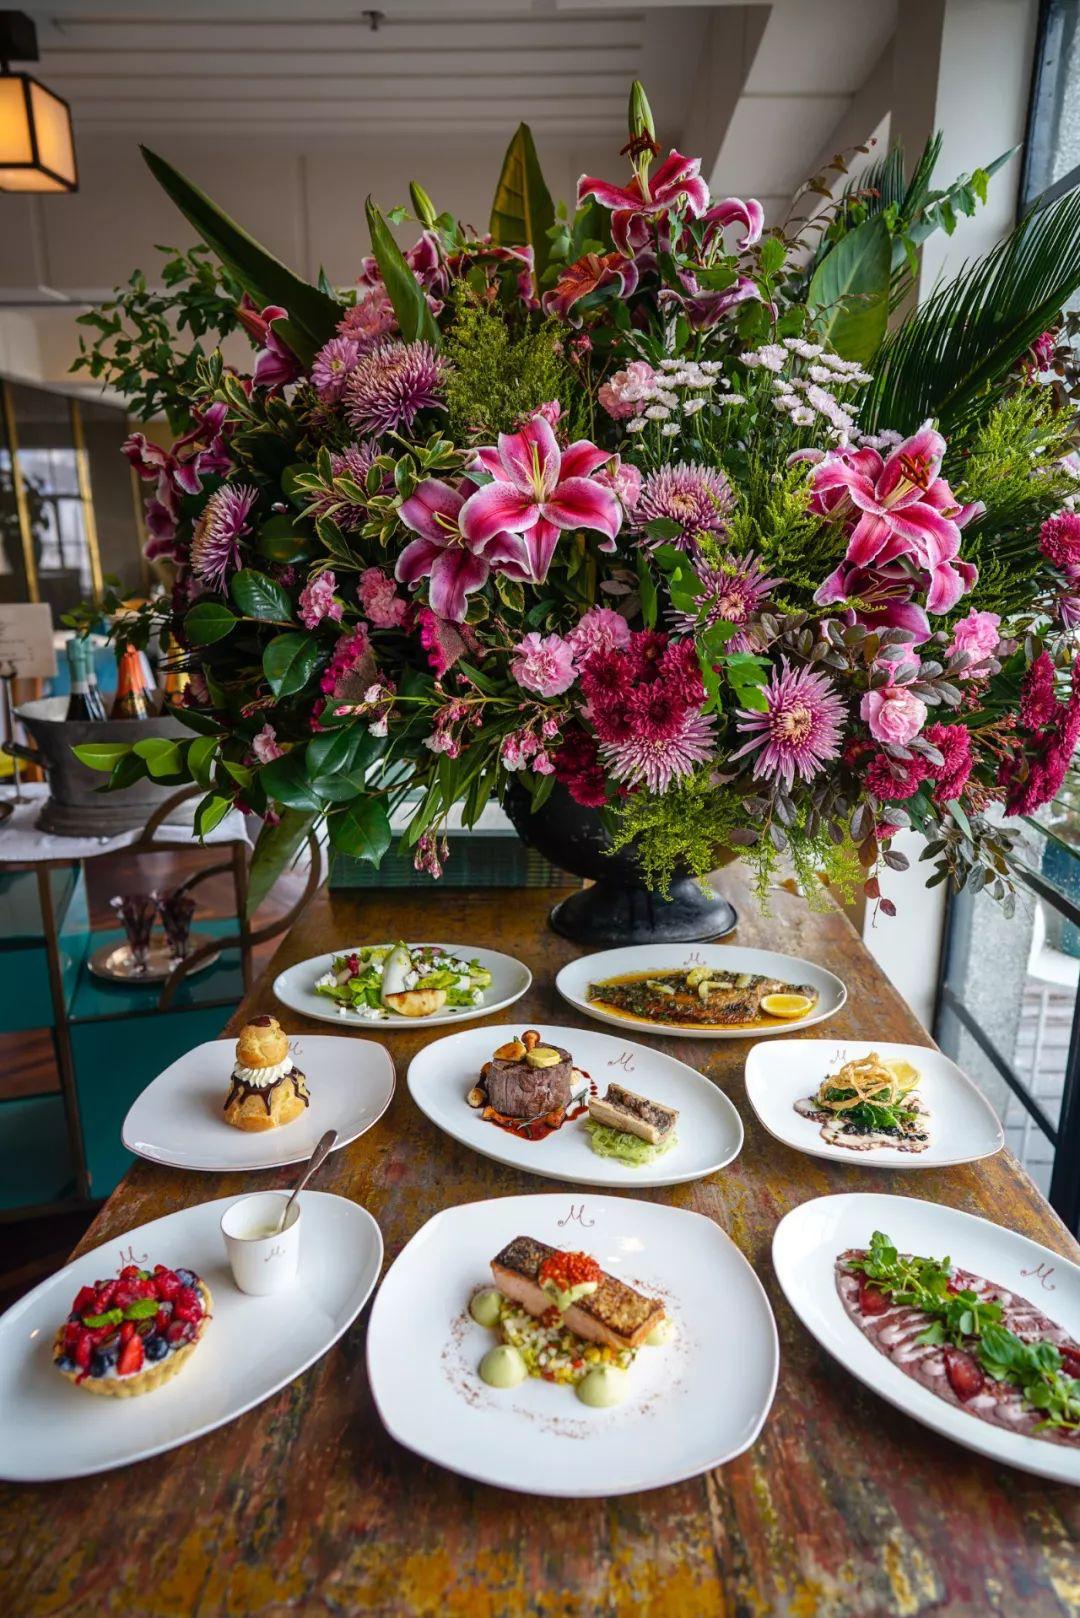 米氏西餐厅晚餐菜单更新 NEW DINNER DISHES AT M